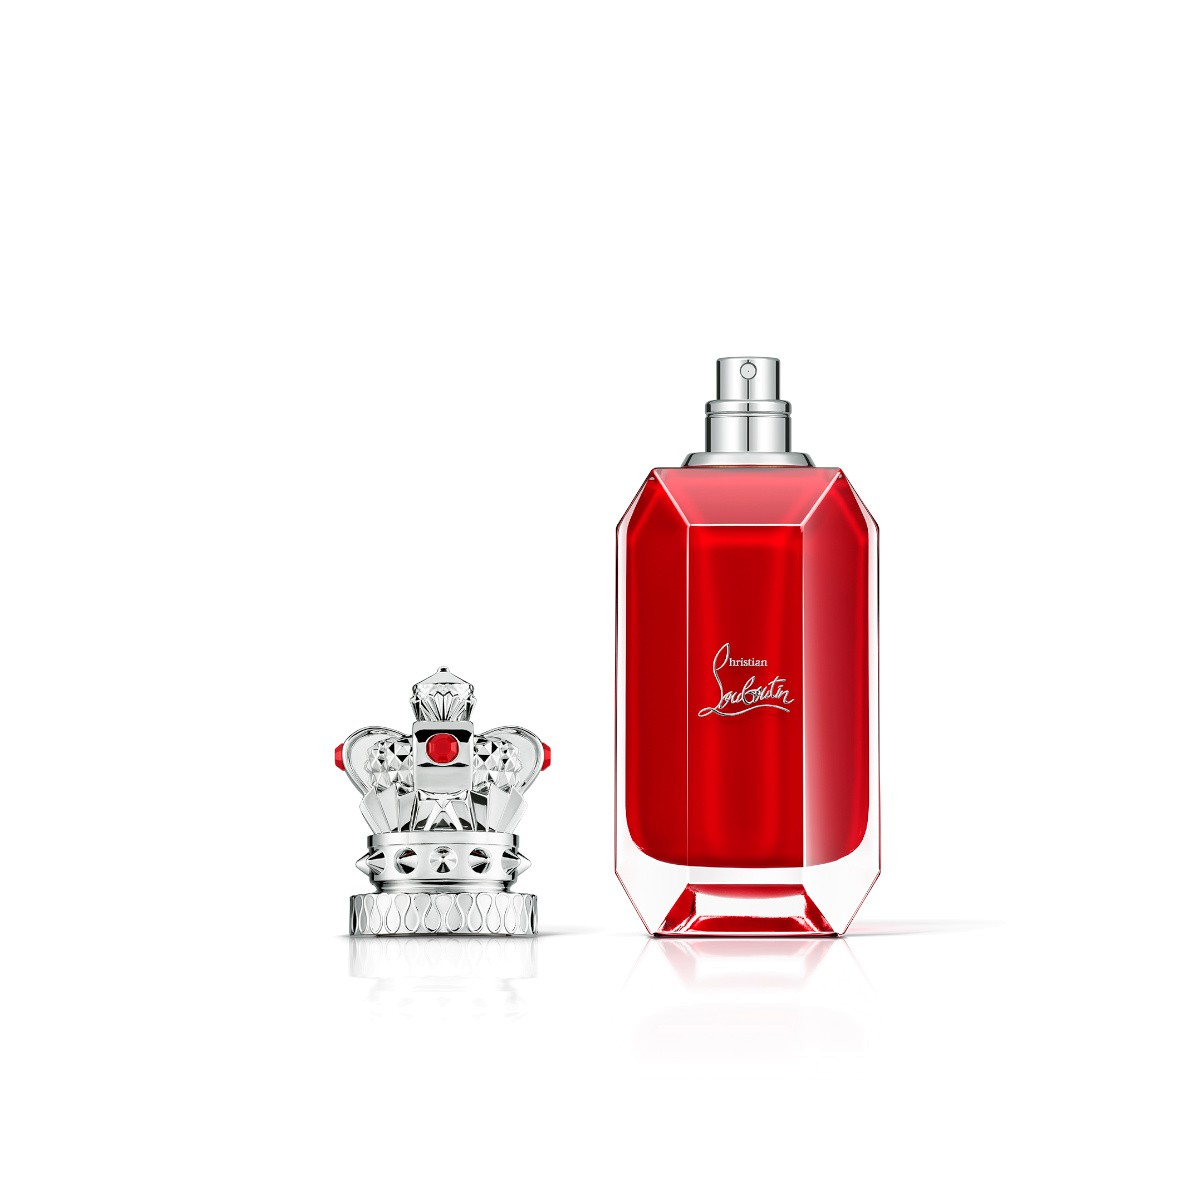 化妝品 - Loubicrown Eau De Parfum - Christian Louboutin